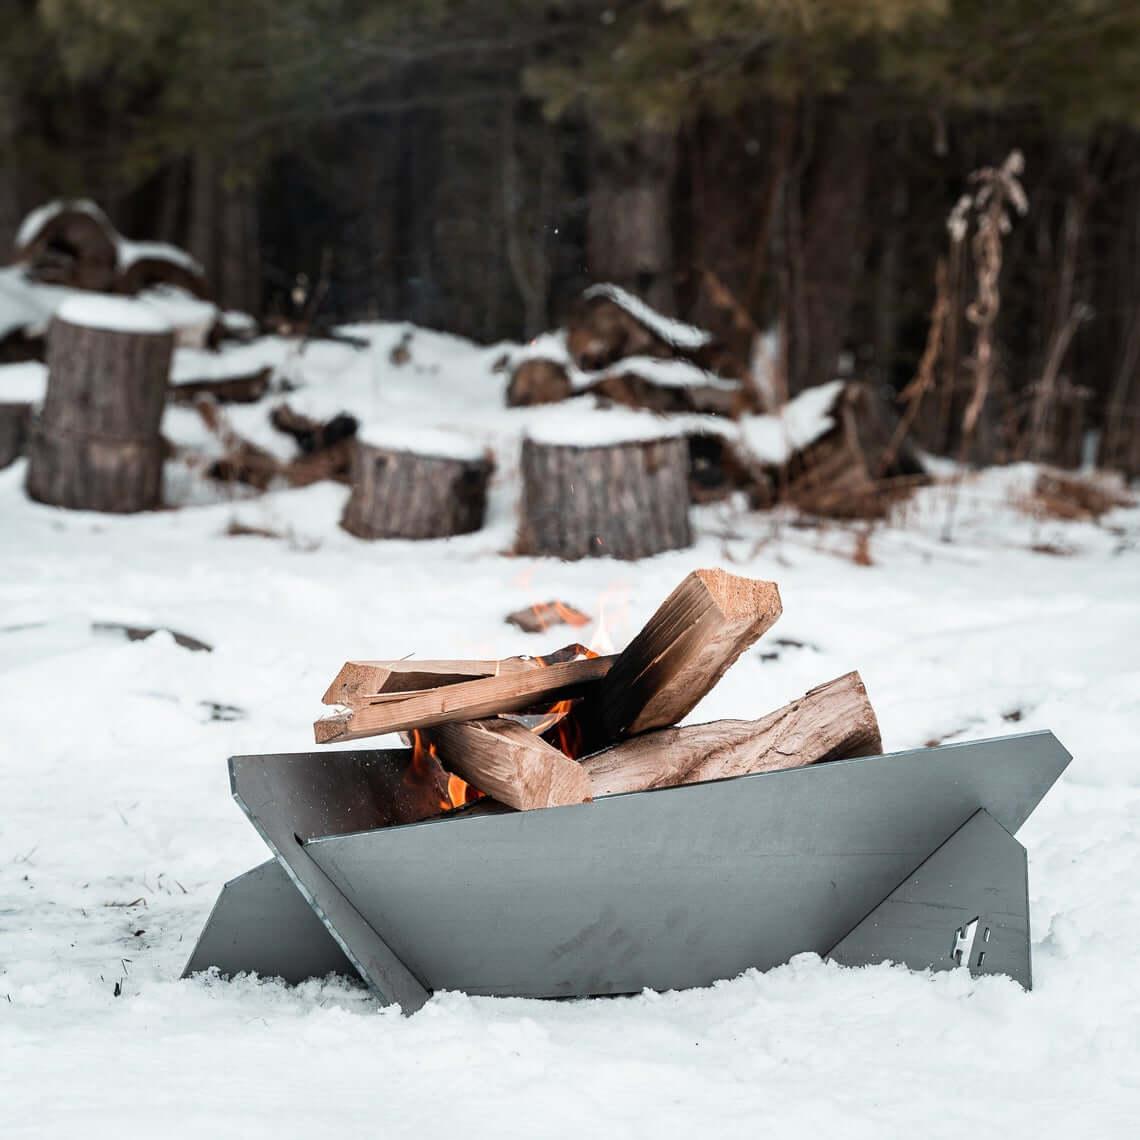 Versatile Hot Rolled Steel Fire Pit